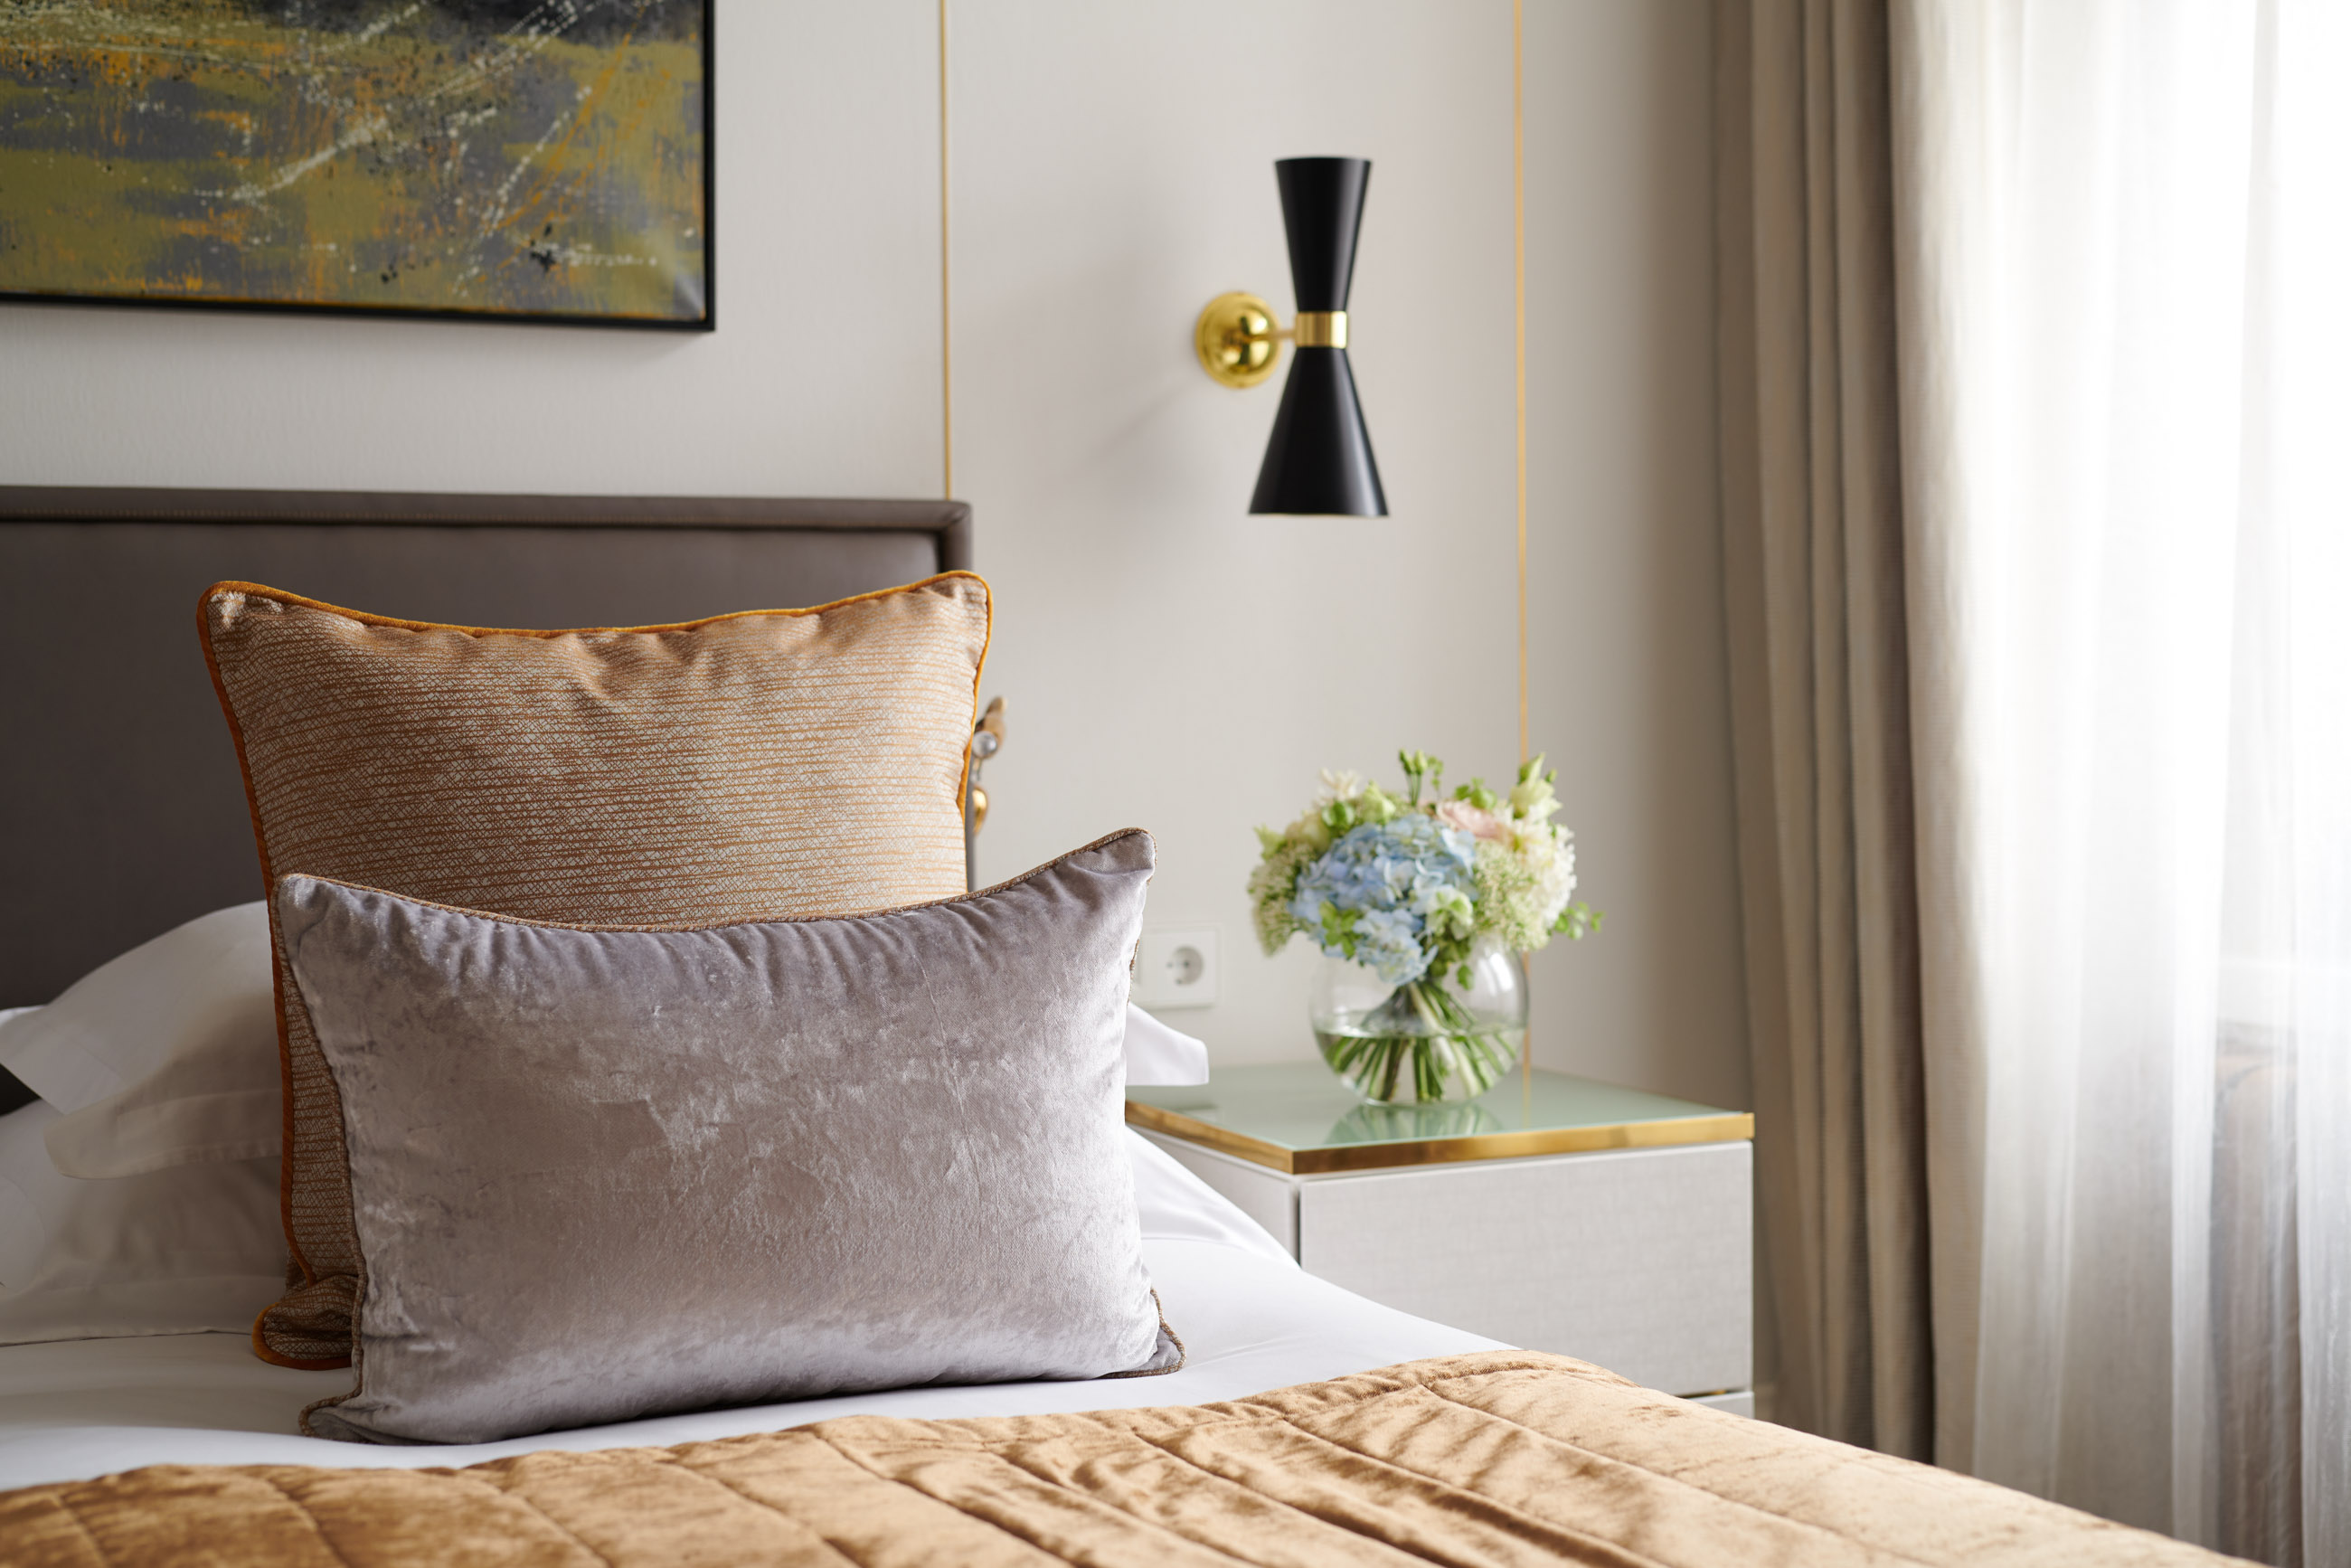 https://bubo.sk/uploads/galleries/5056/corinthia_st_petersburg_signaturesuite_bedroom_detail.jpg